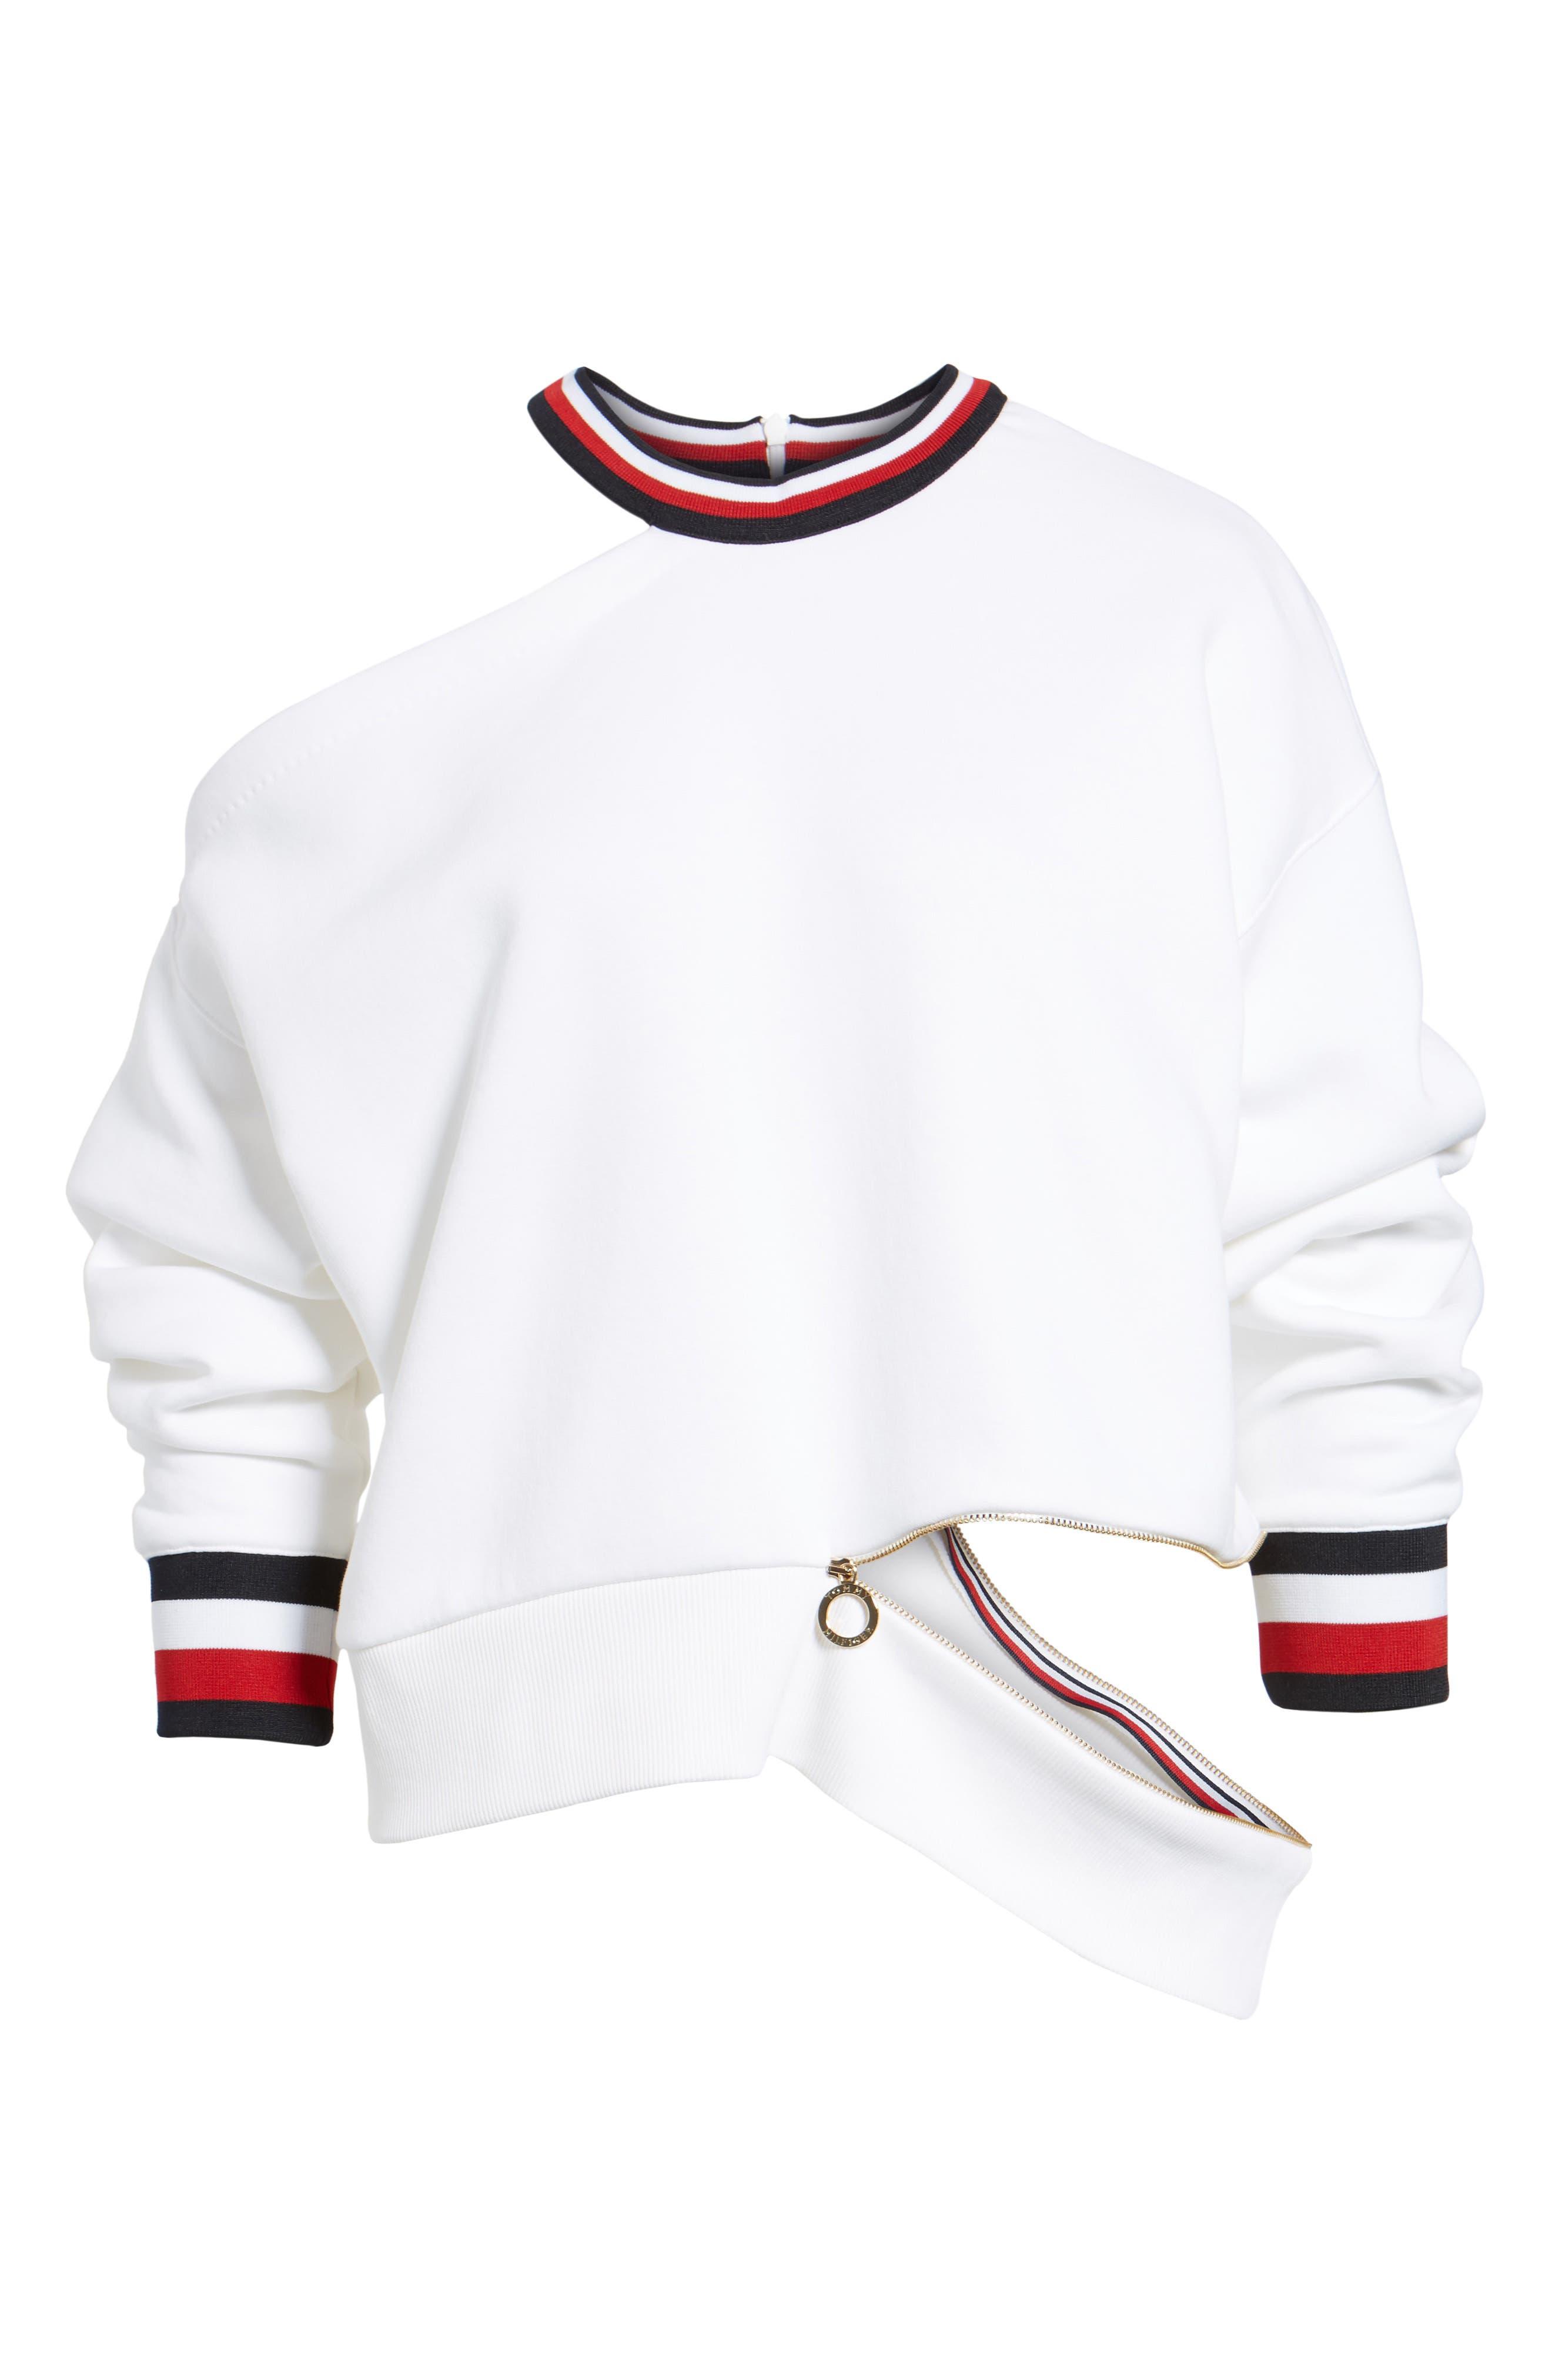 x Gigi Hadid Cold Shoulder Sweatshirt,                             Alternate thumbnail 8, color,                             Classic White